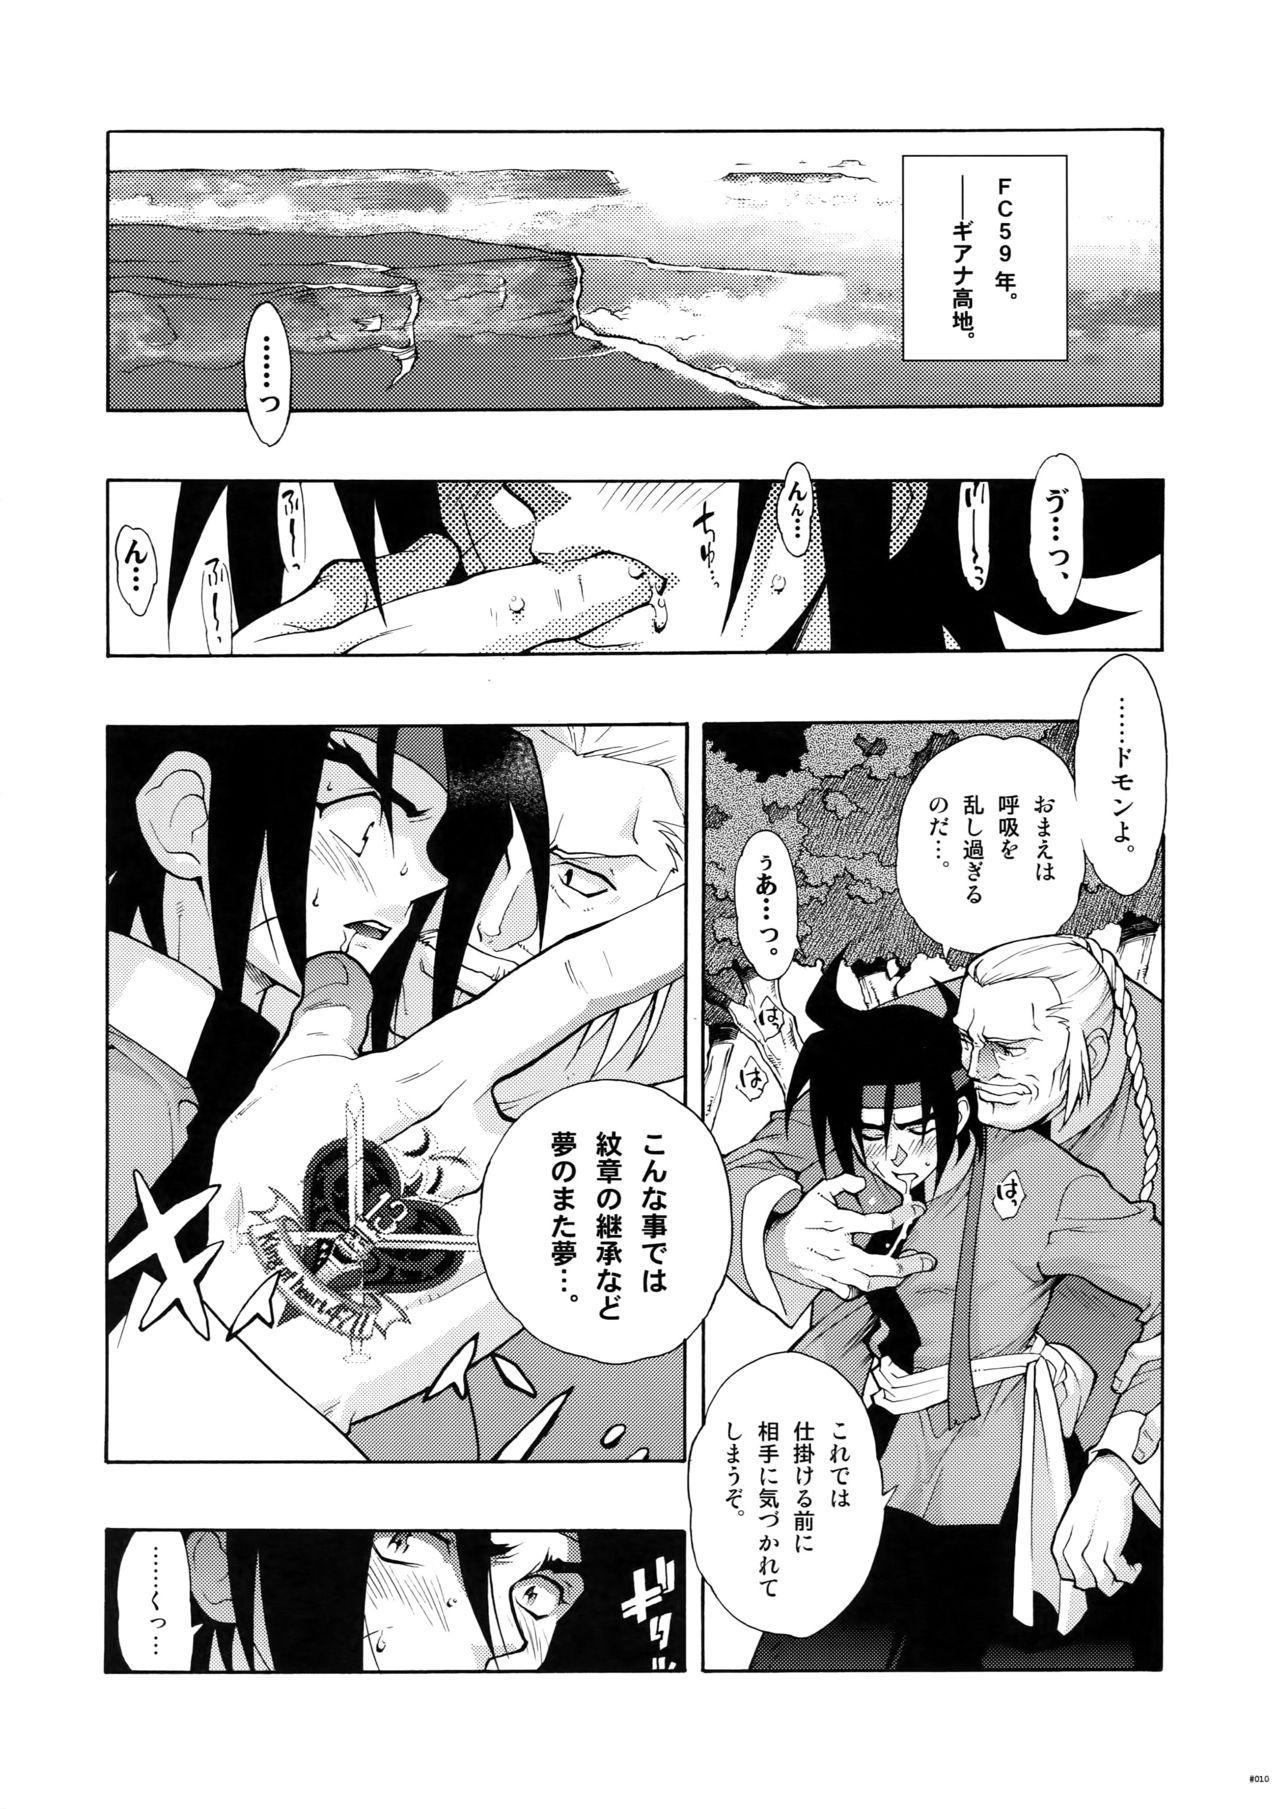 [Article 60 of Criminal Code (Shuhan)] G-gan Josei-Muke Sairoku-Shuu (G Gundam) 9